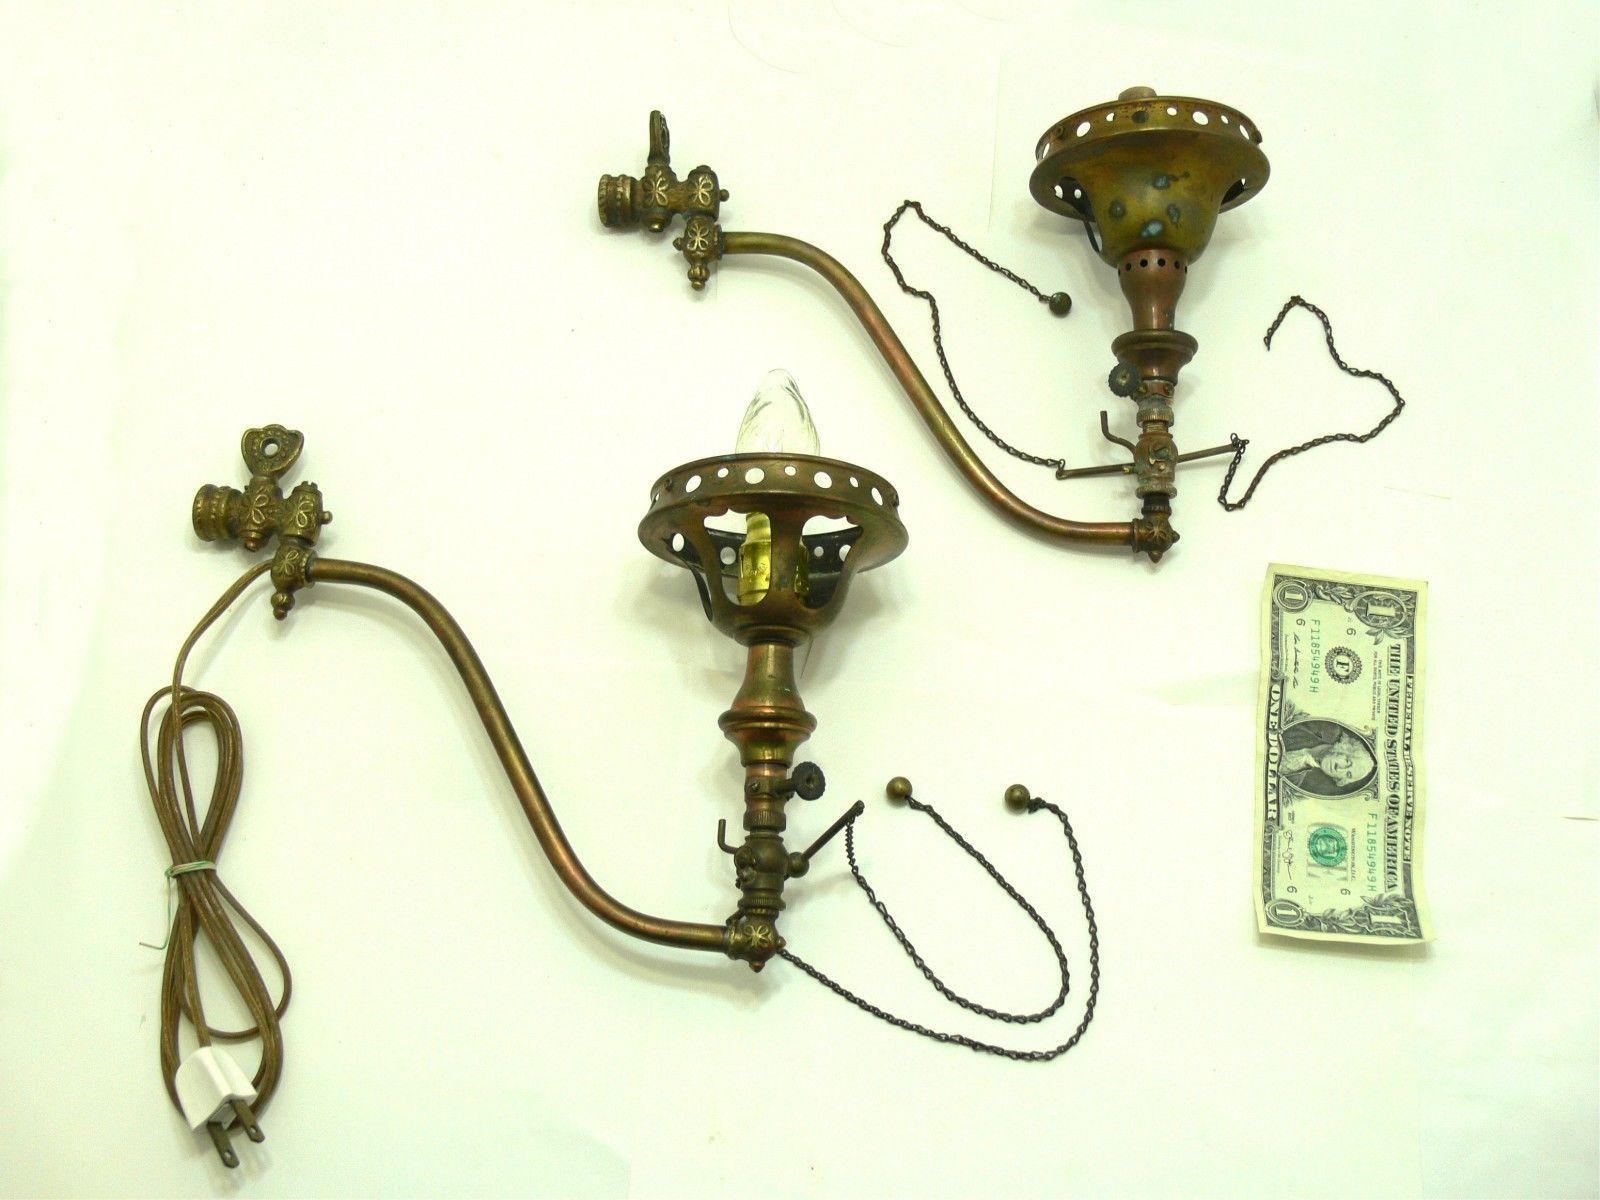 Vintage gas lamp parts vintage lighting antique lamps antique vintage gas lamp parts vintage lighting antique lamps antique lighting old antique light parts antique gas lamp fixture valve arubaitofo Images